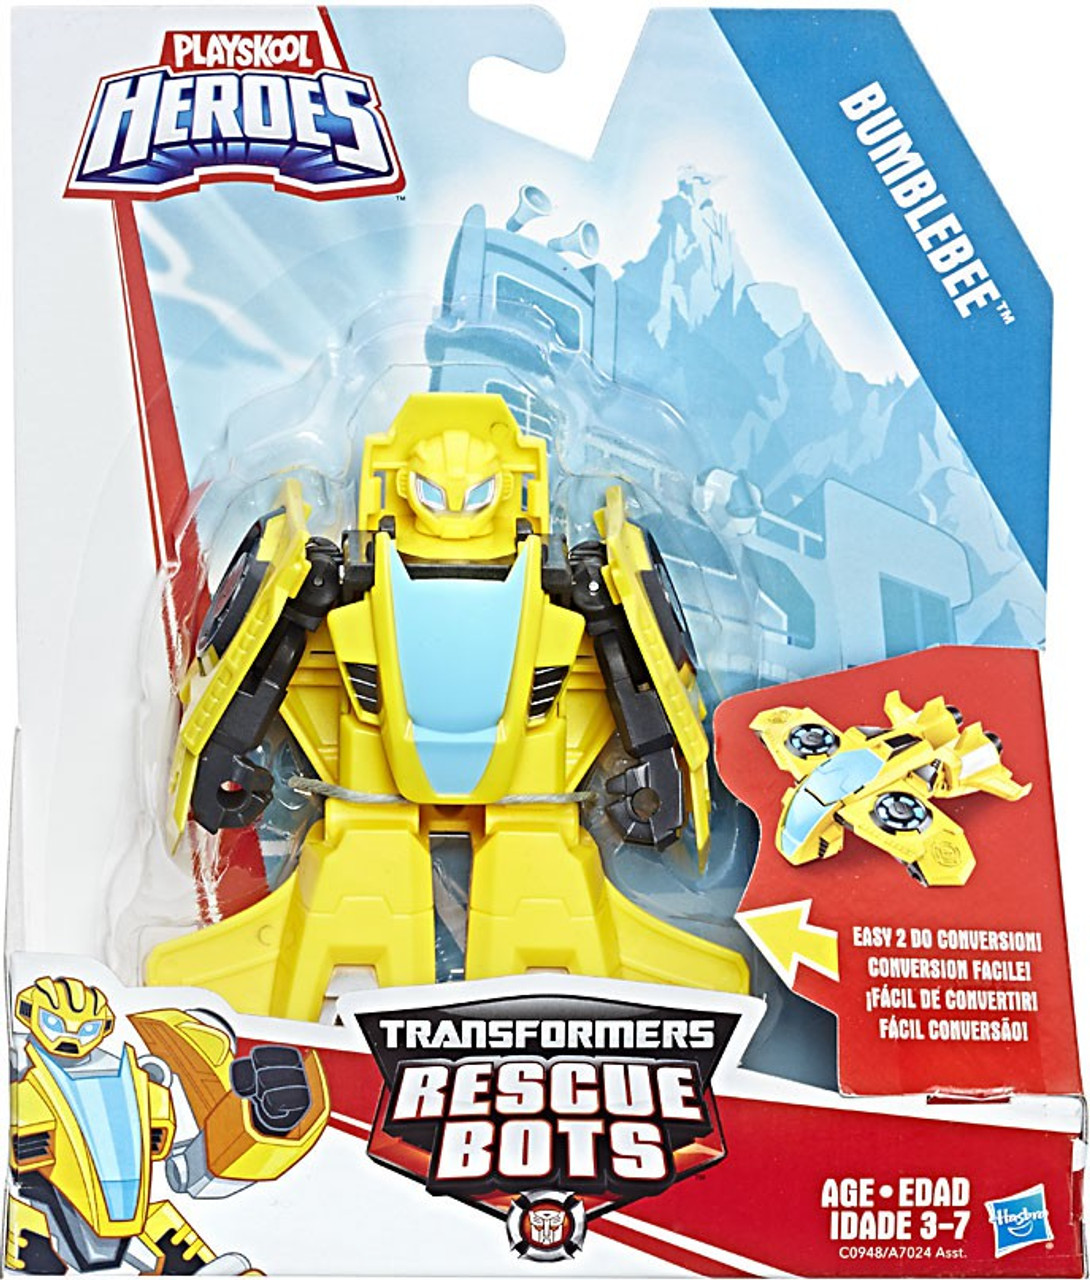 Transformers Rescue Bots Playskool Heroes Bumblebee Action Figure Rescan Hasbro Toys